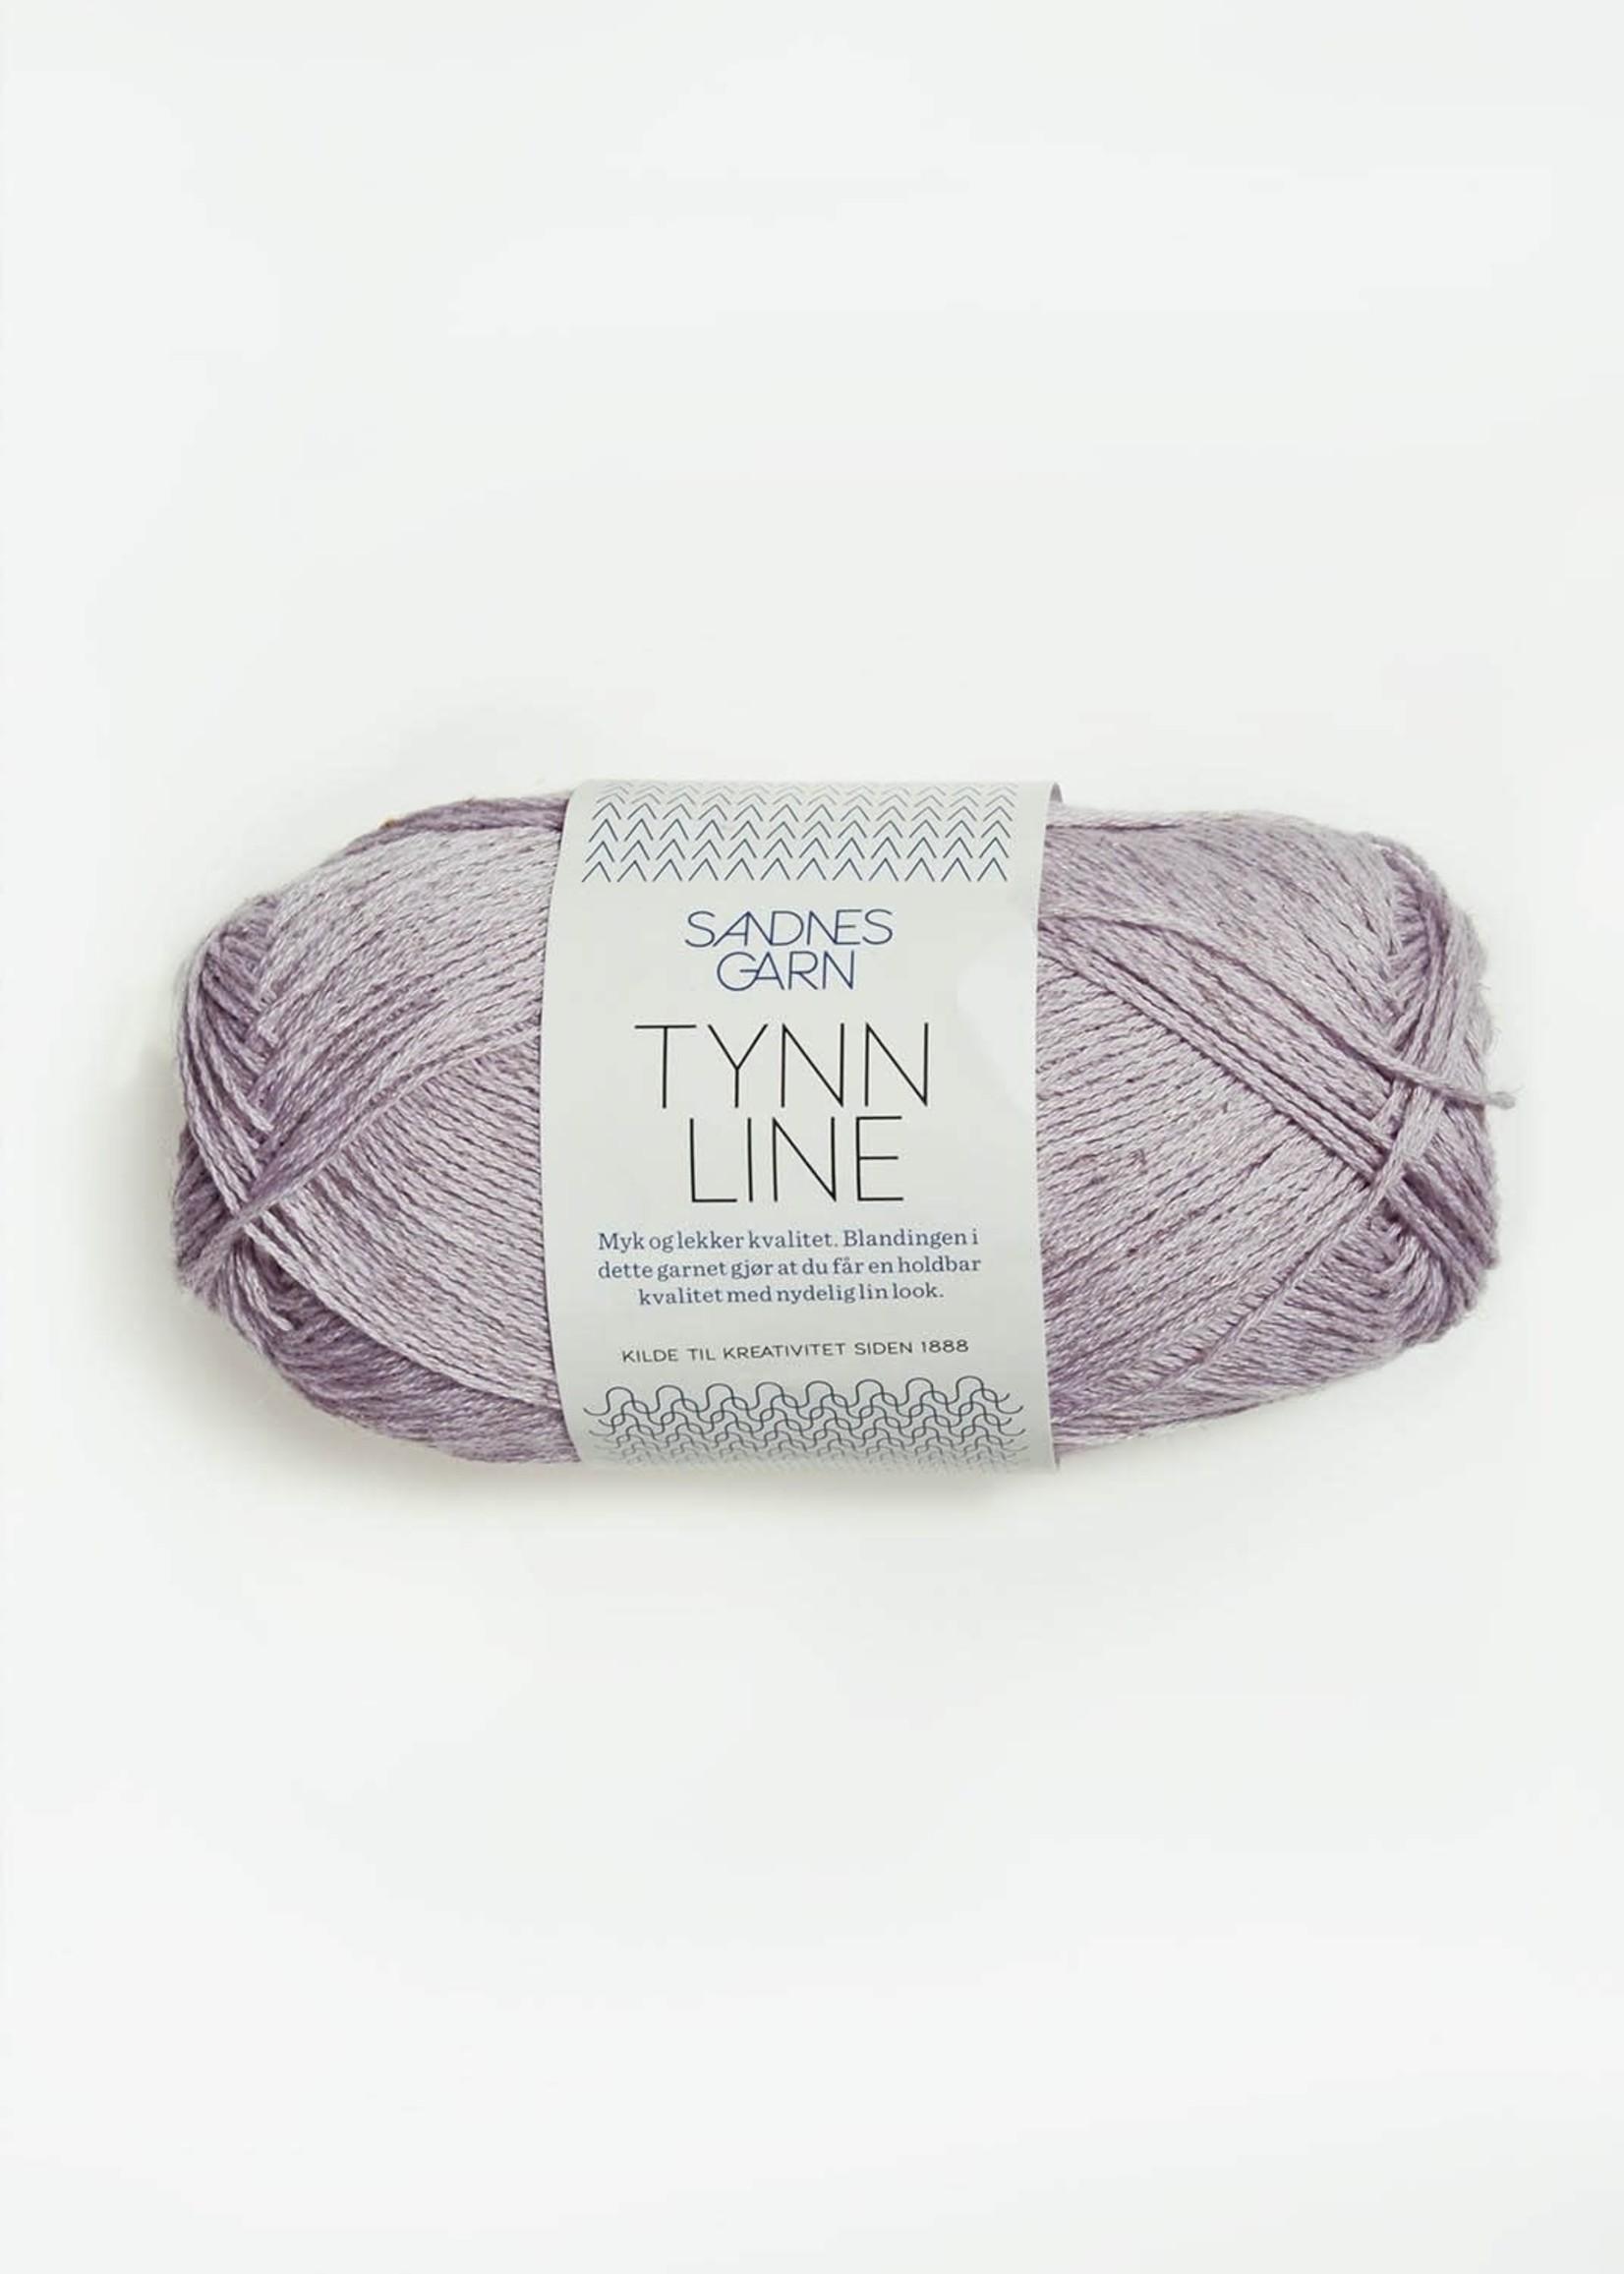 Sandnes Garn Tynn Line - Lys Syrin #4620